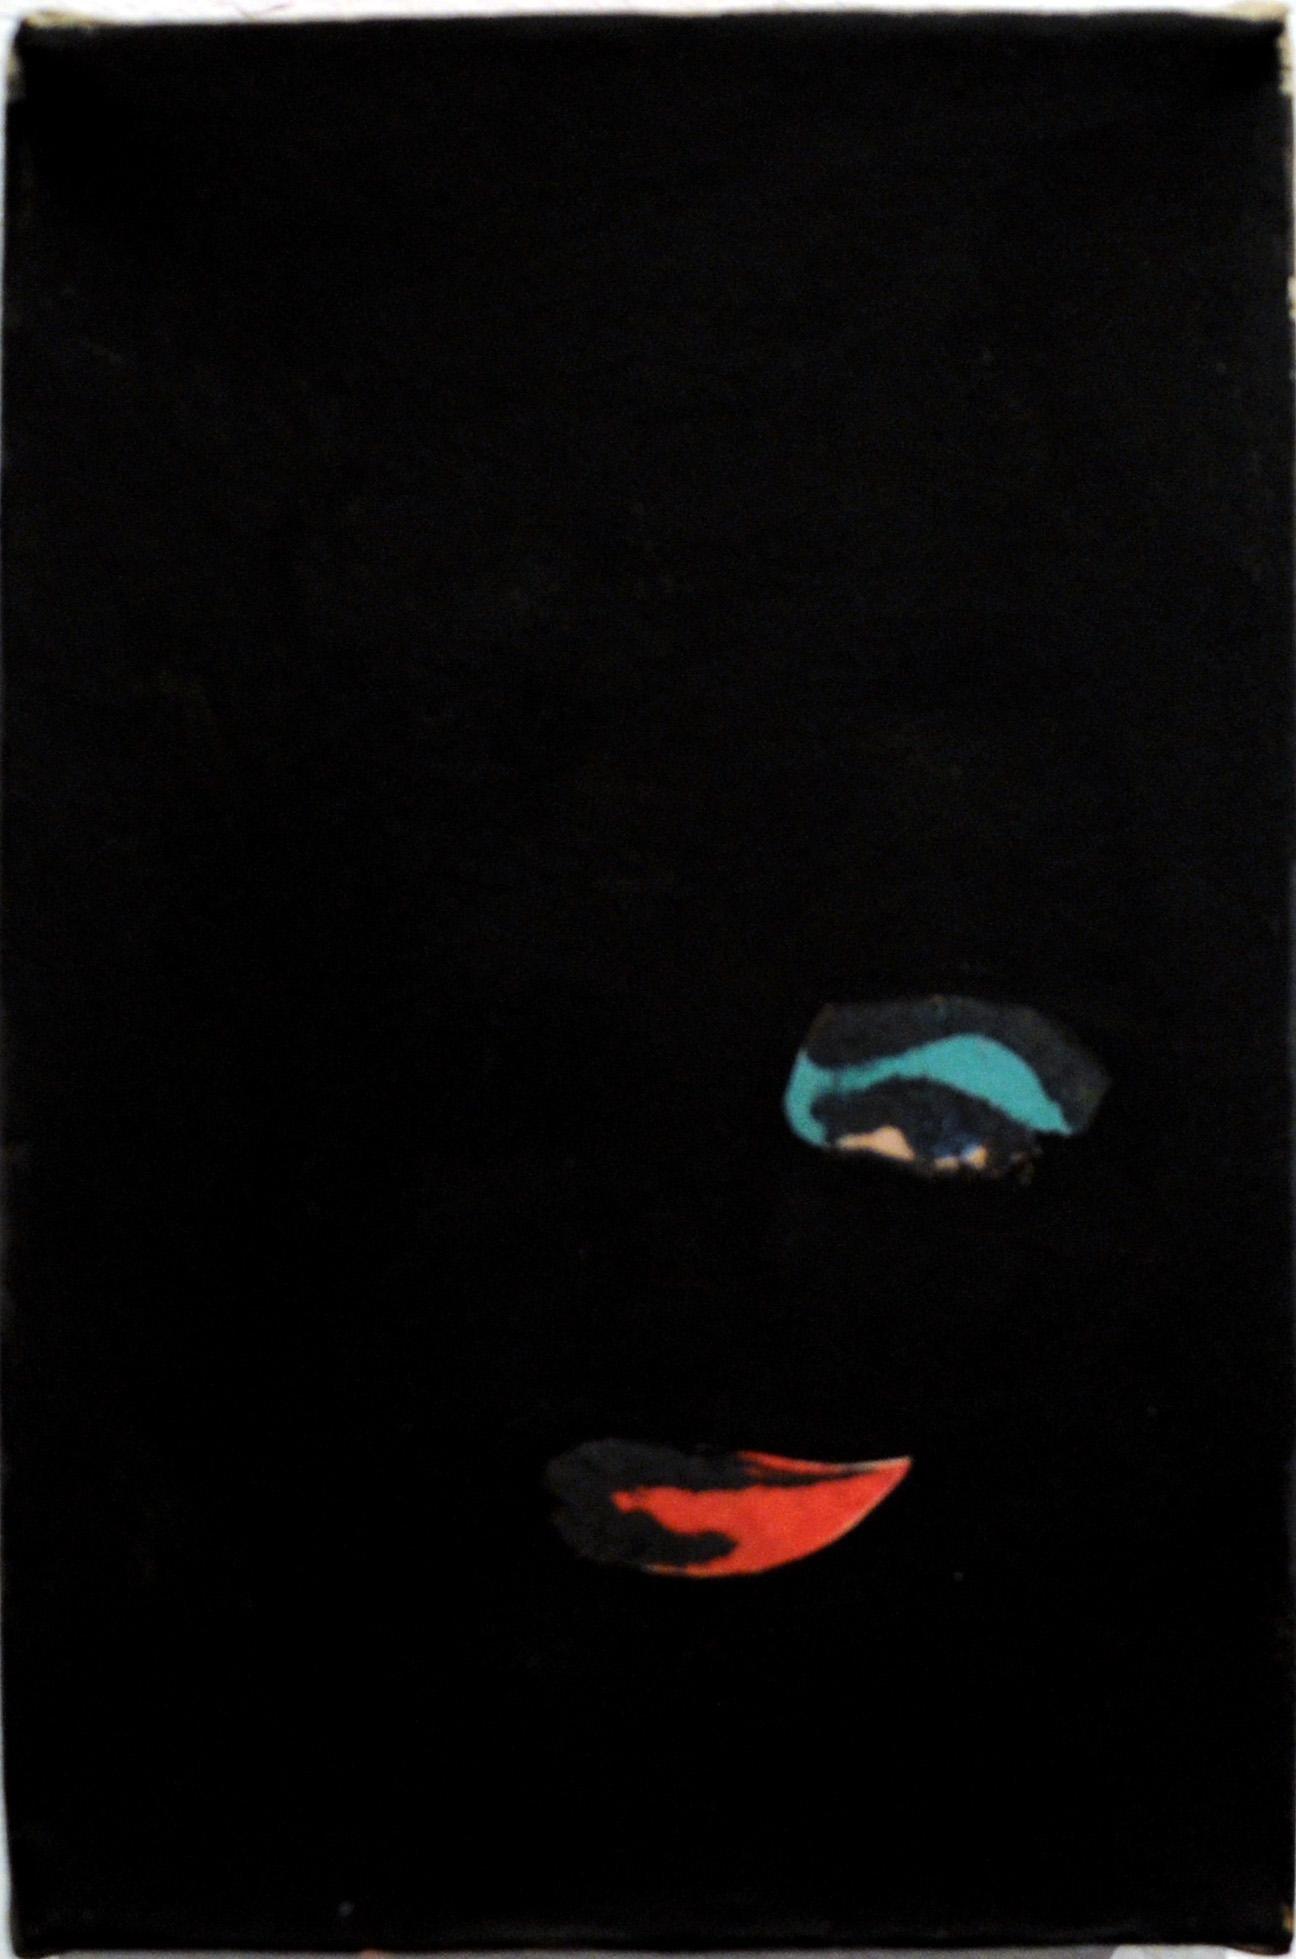 Anne Deleporte, Liz, Gesso on Newsprint, 2014, Elizabeth Taylor, Andy Warhol